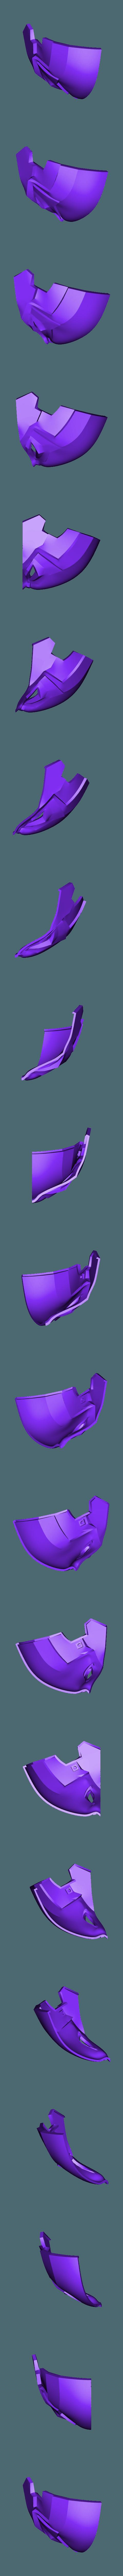 Two Eyes Part 1.stl Download STL file Deathstroke Injustice Helmet • 3D printable model, VillainousPropShop